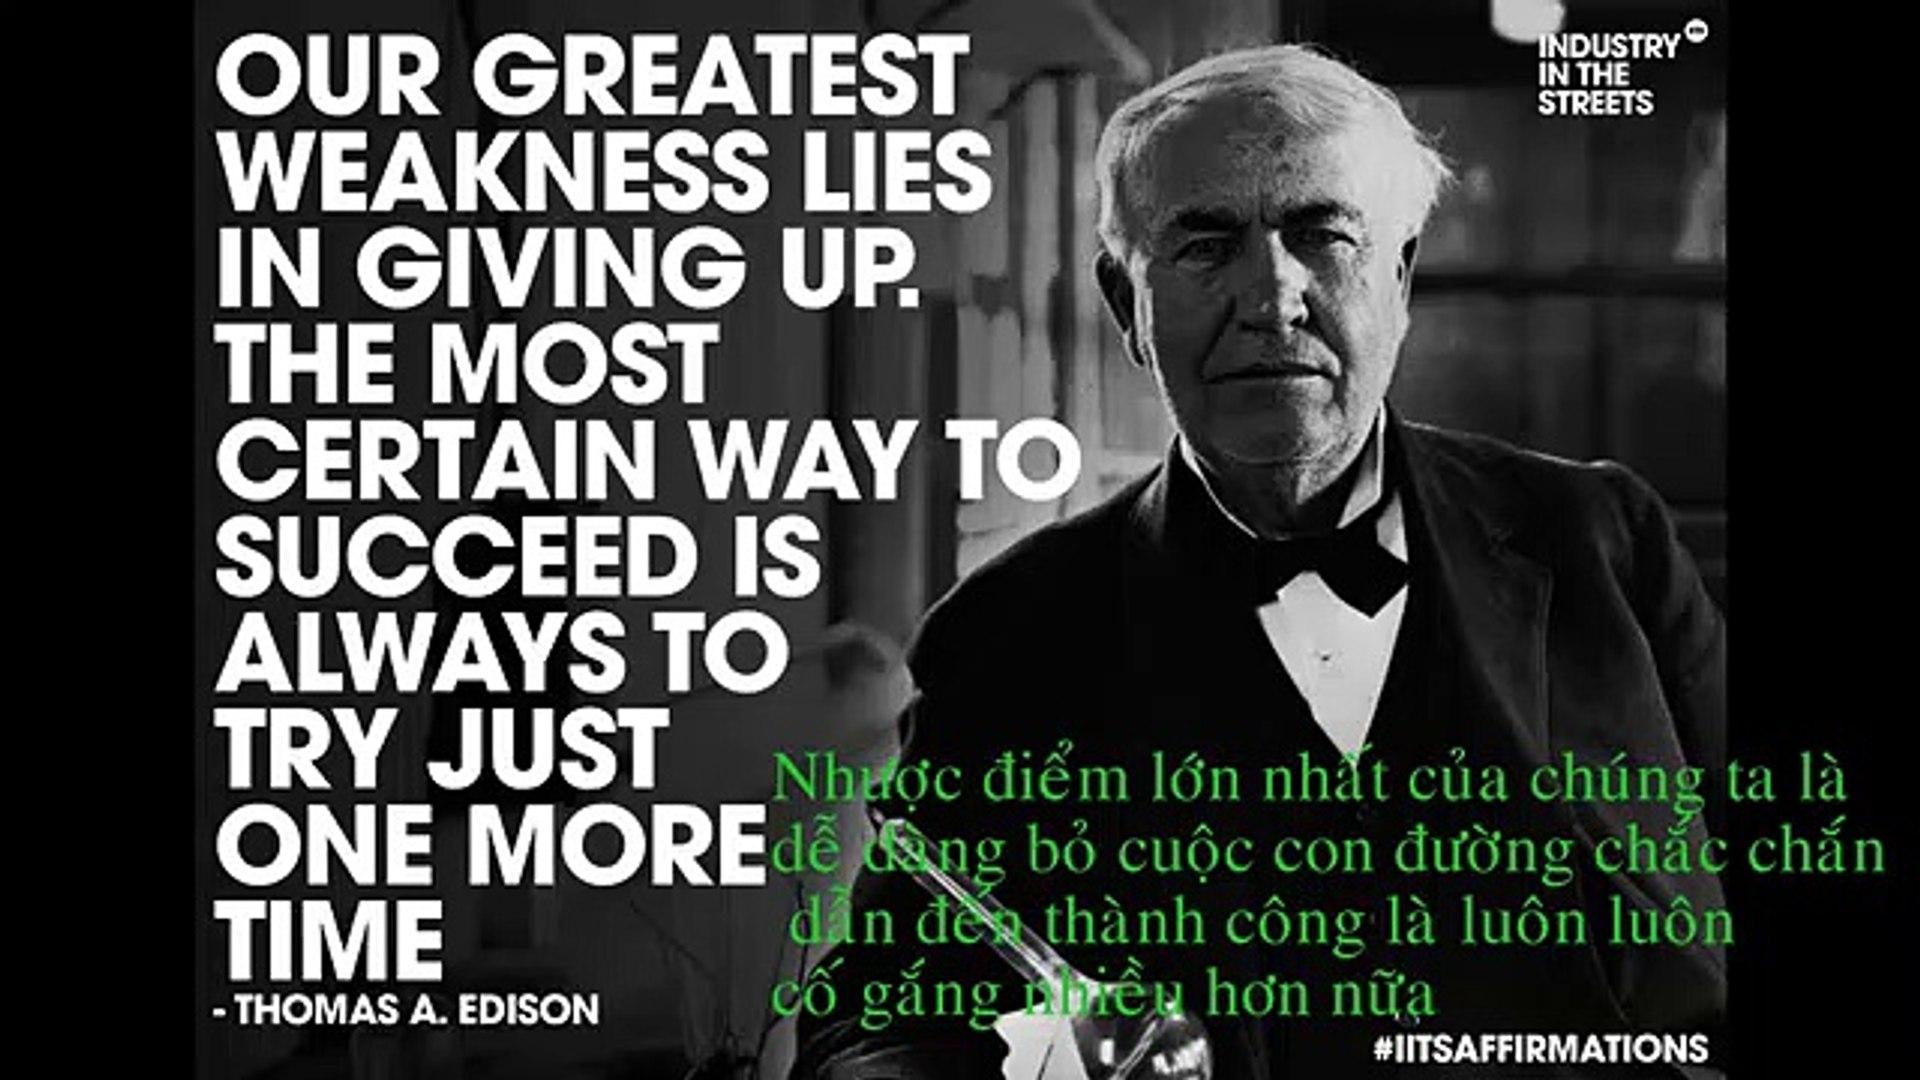 Sang Tao's Thomas Edison on Success and Success